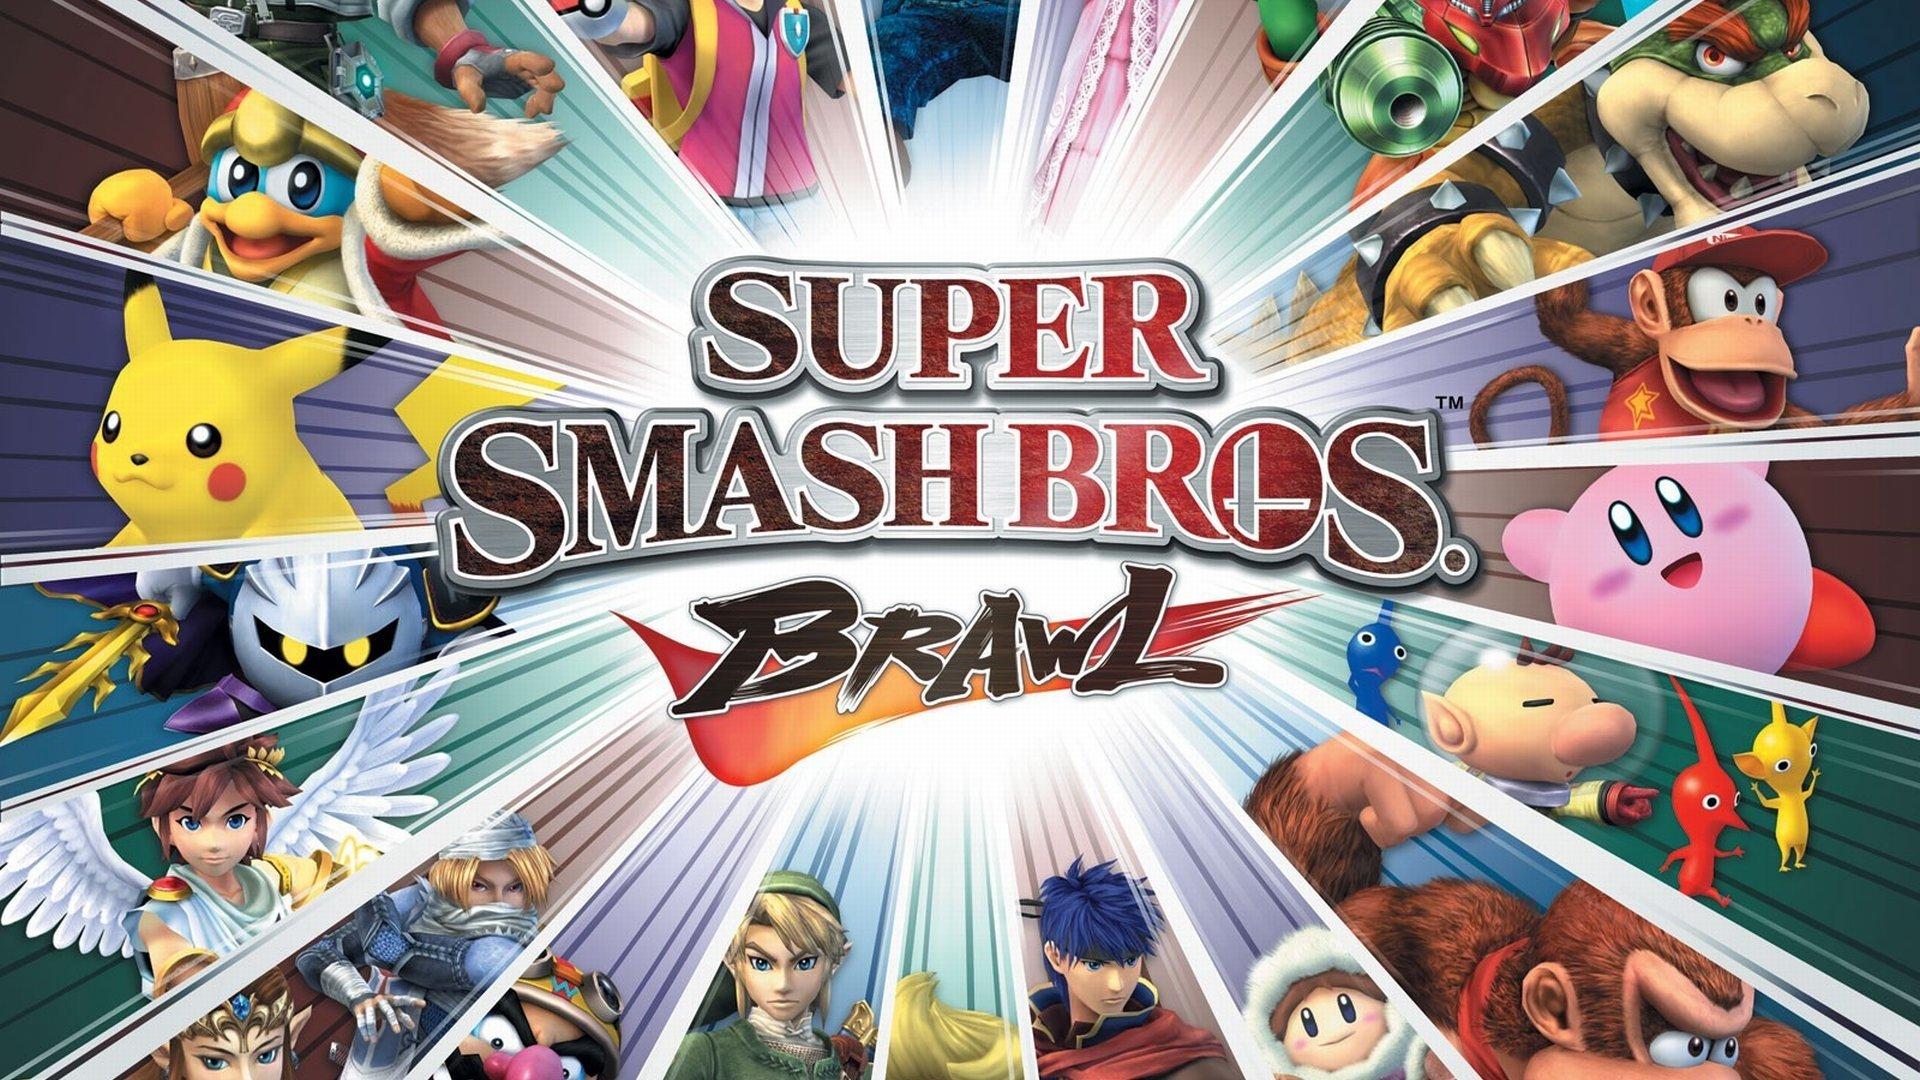 Super Smash Bros. Brawl Full HD Wallpaper and Hintergrund ...